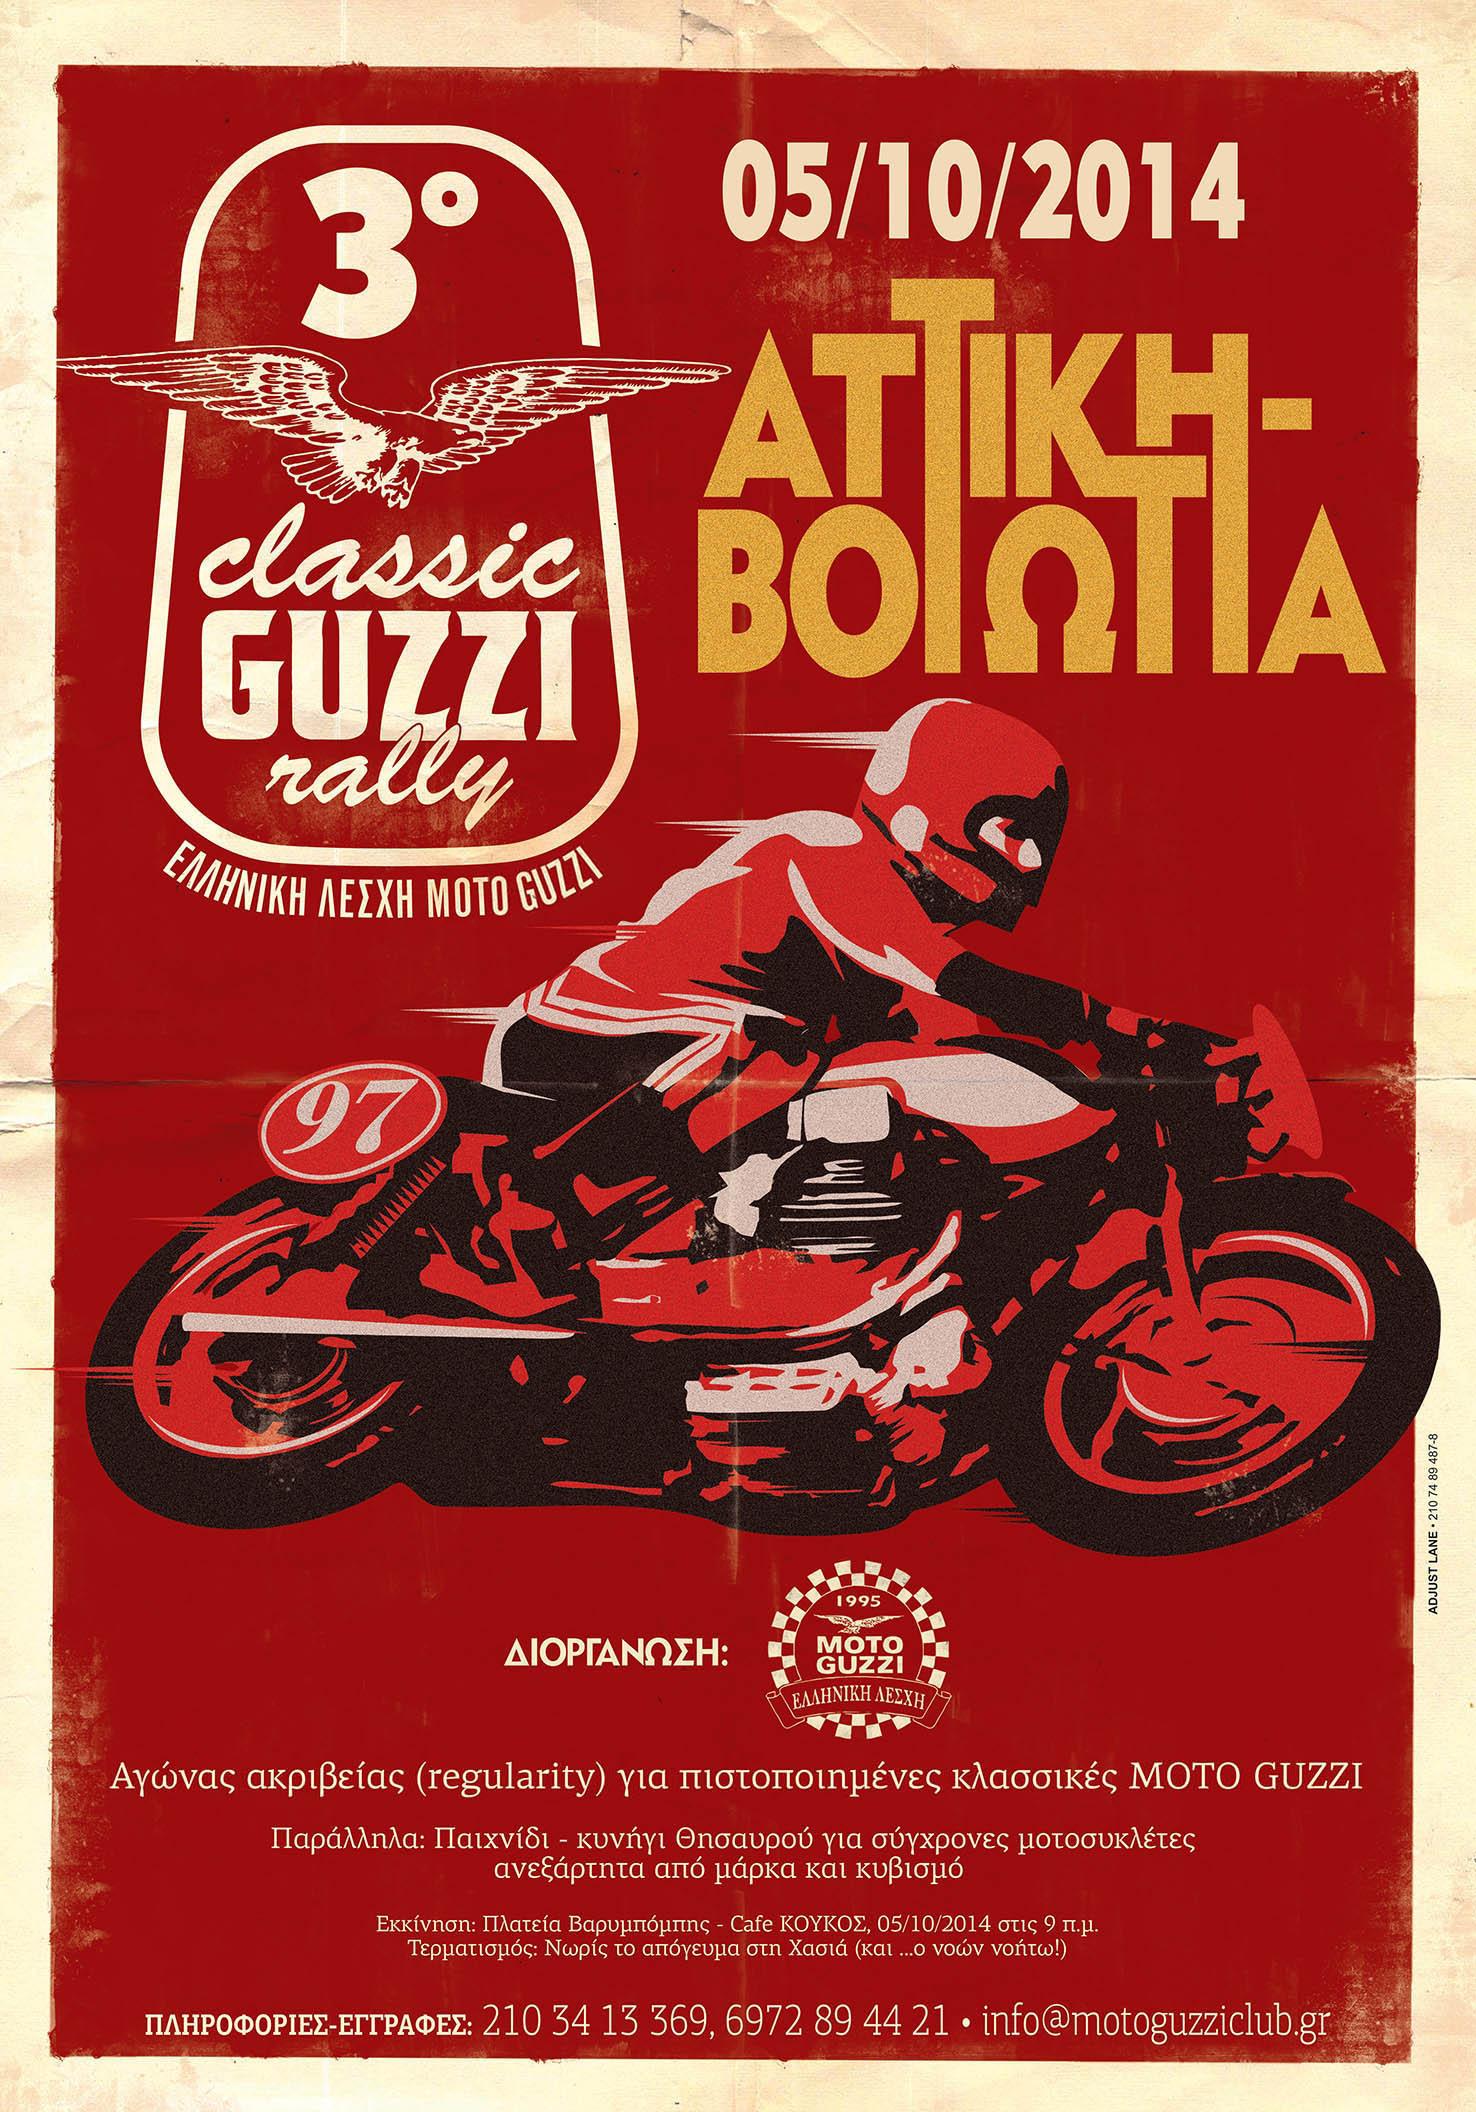 http://www.motoguzziclub.gr//images/3guzzi_rally.jpg